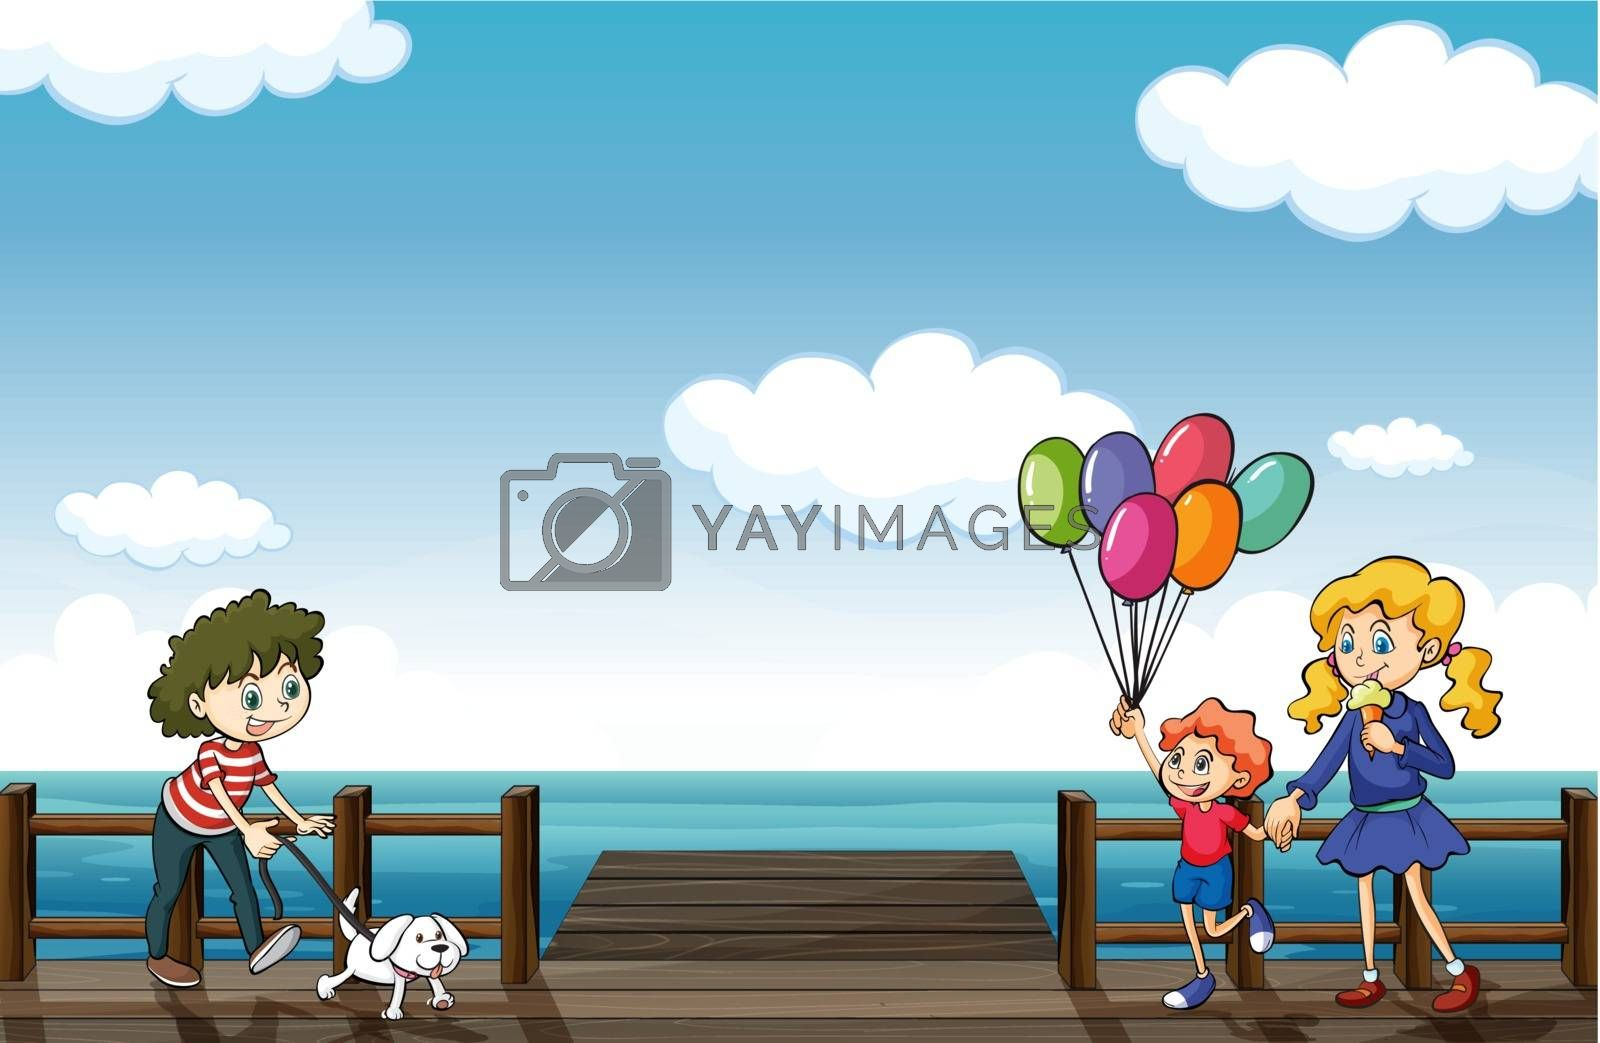 Illustration of happy people strolling in the seaside